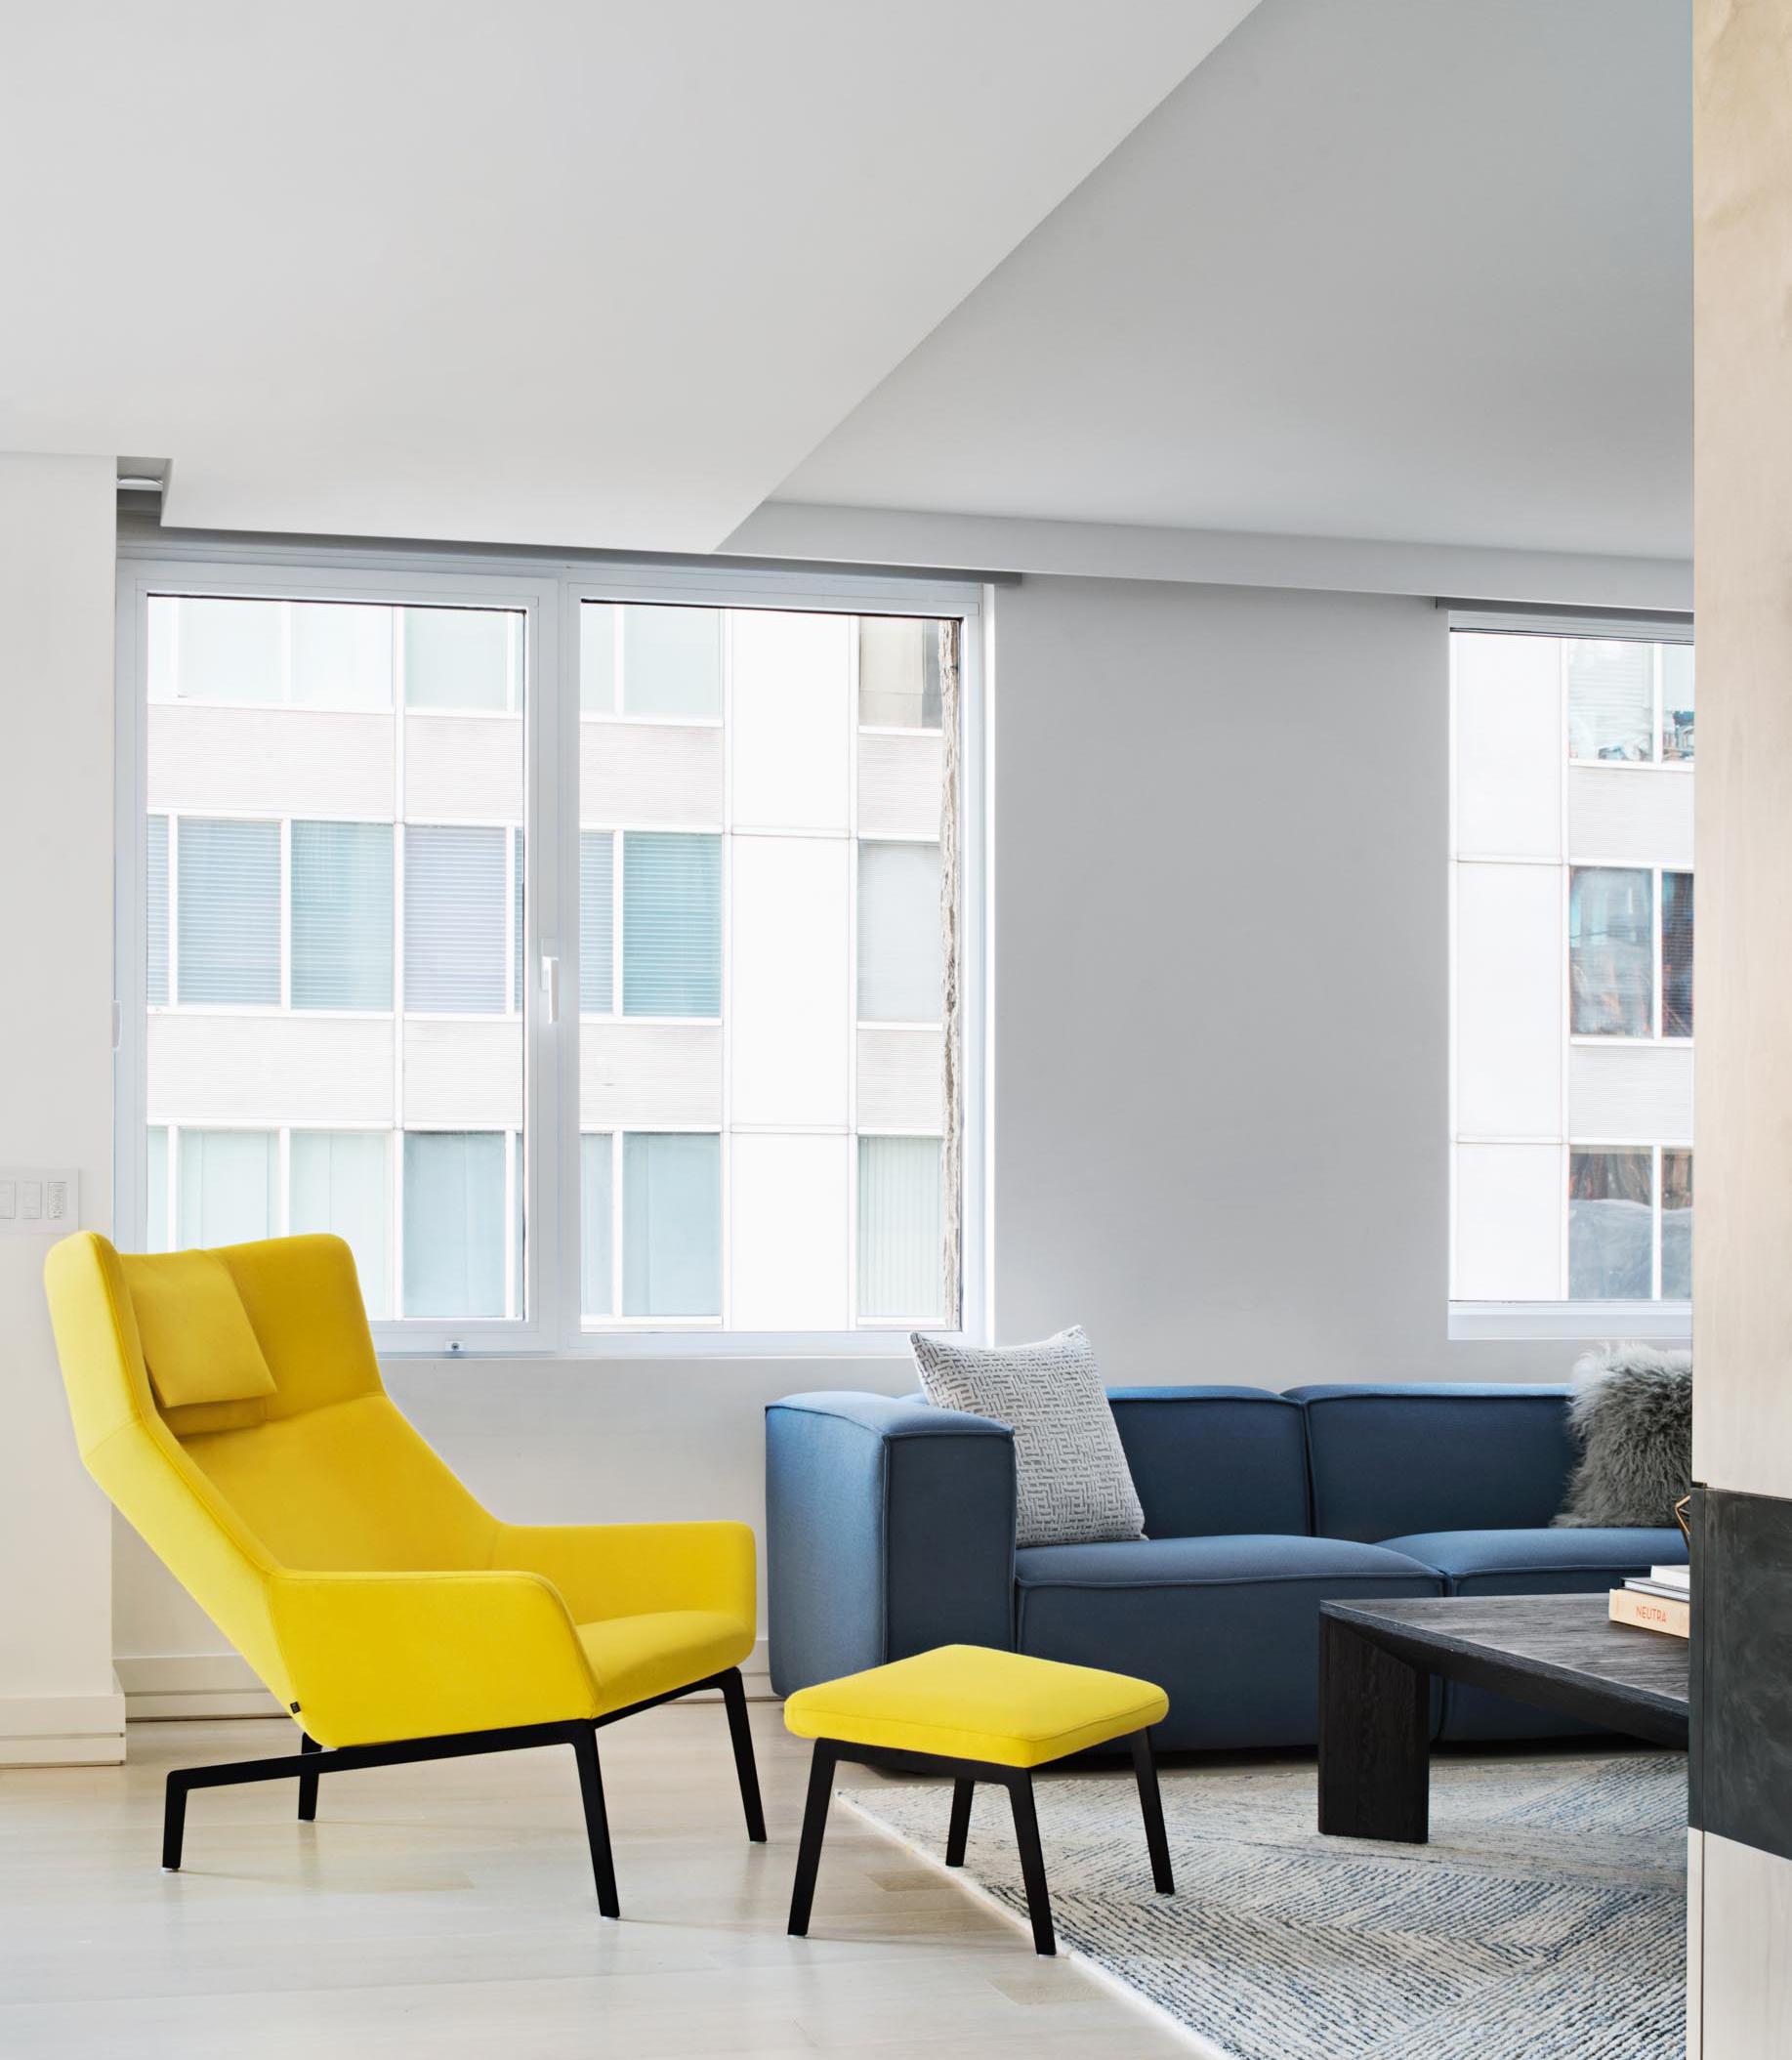 Lincoln Center Residence Manhattan, NY StudioLAB